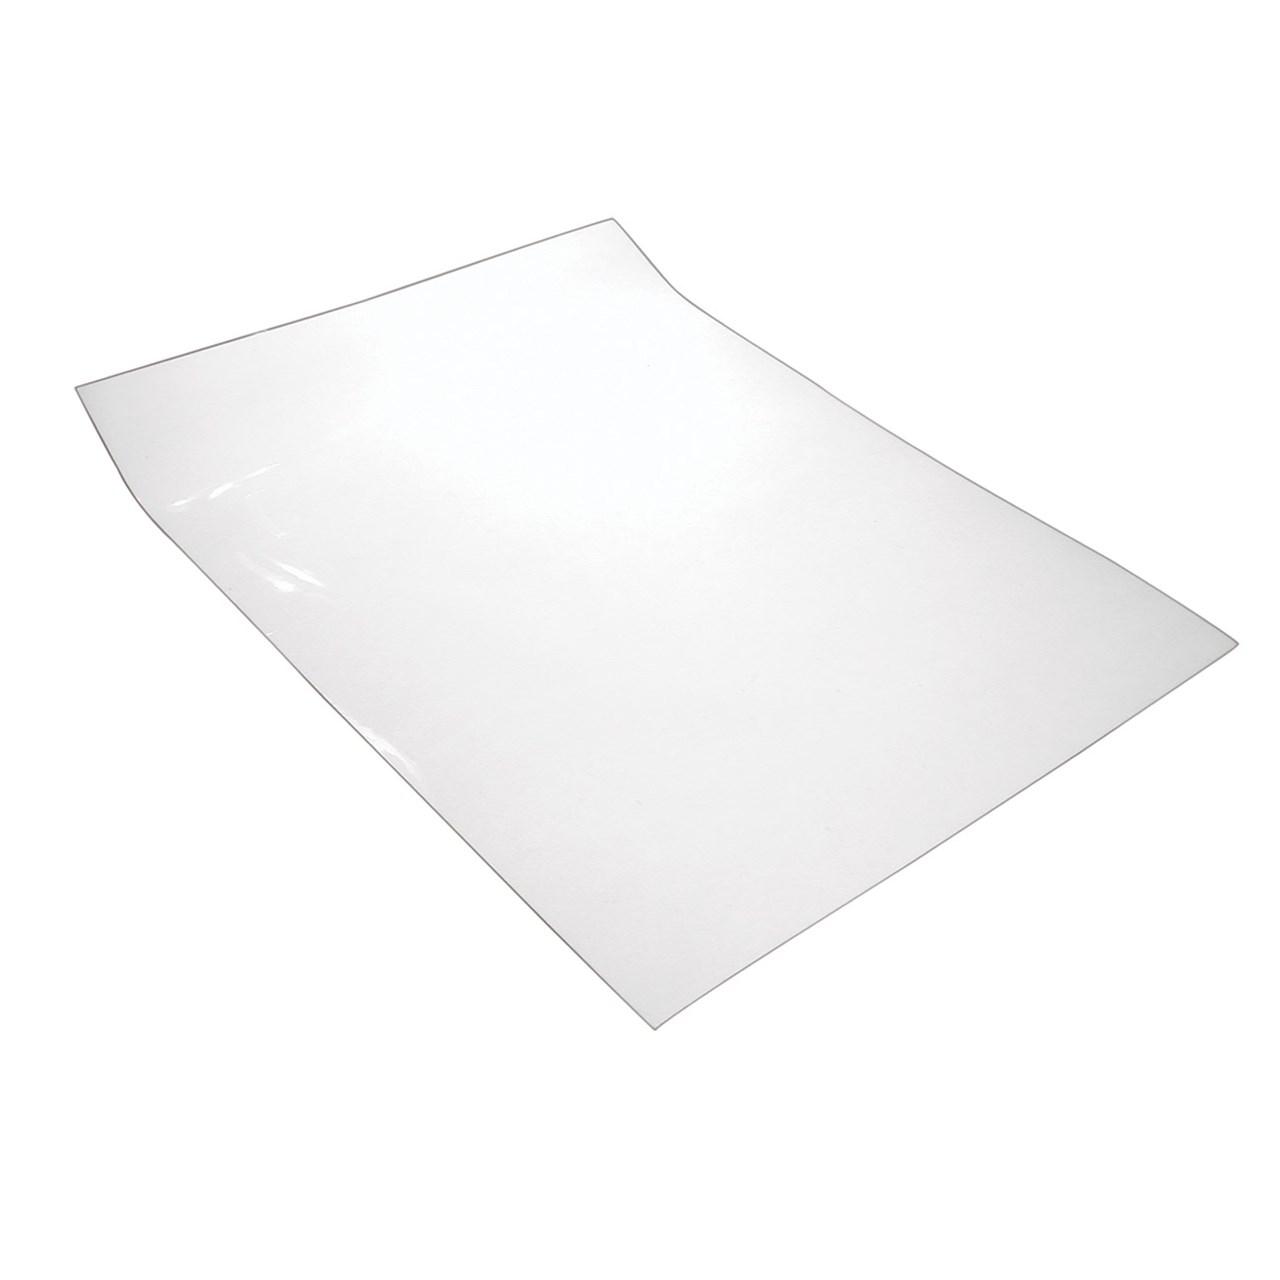 plastic laminate 9 x 12 inch sheet BDPEUWN